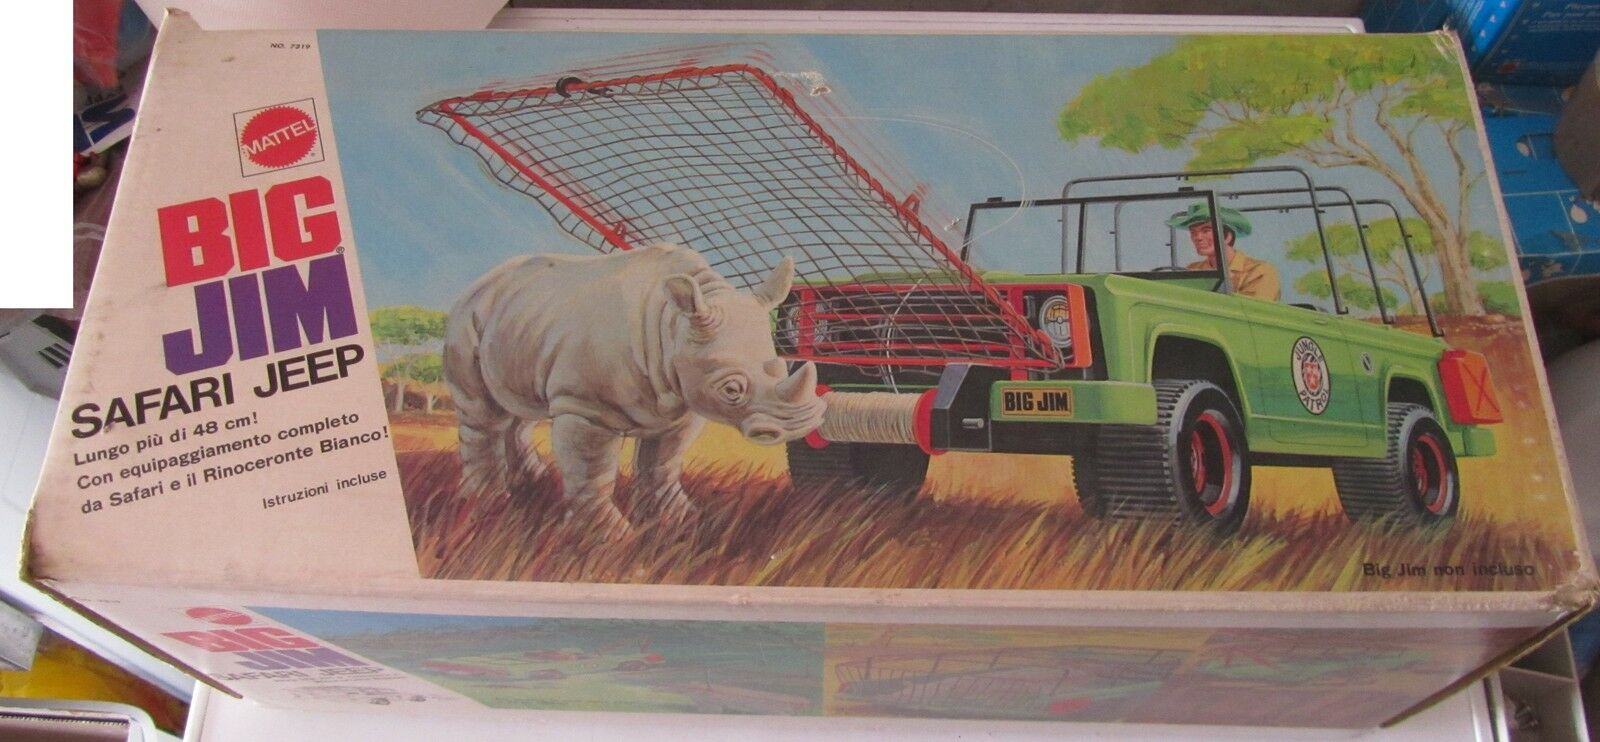 BIG JIM Safari Jeep Caccia al Rinoceronte Mattel 7319 SPESE GRATIS